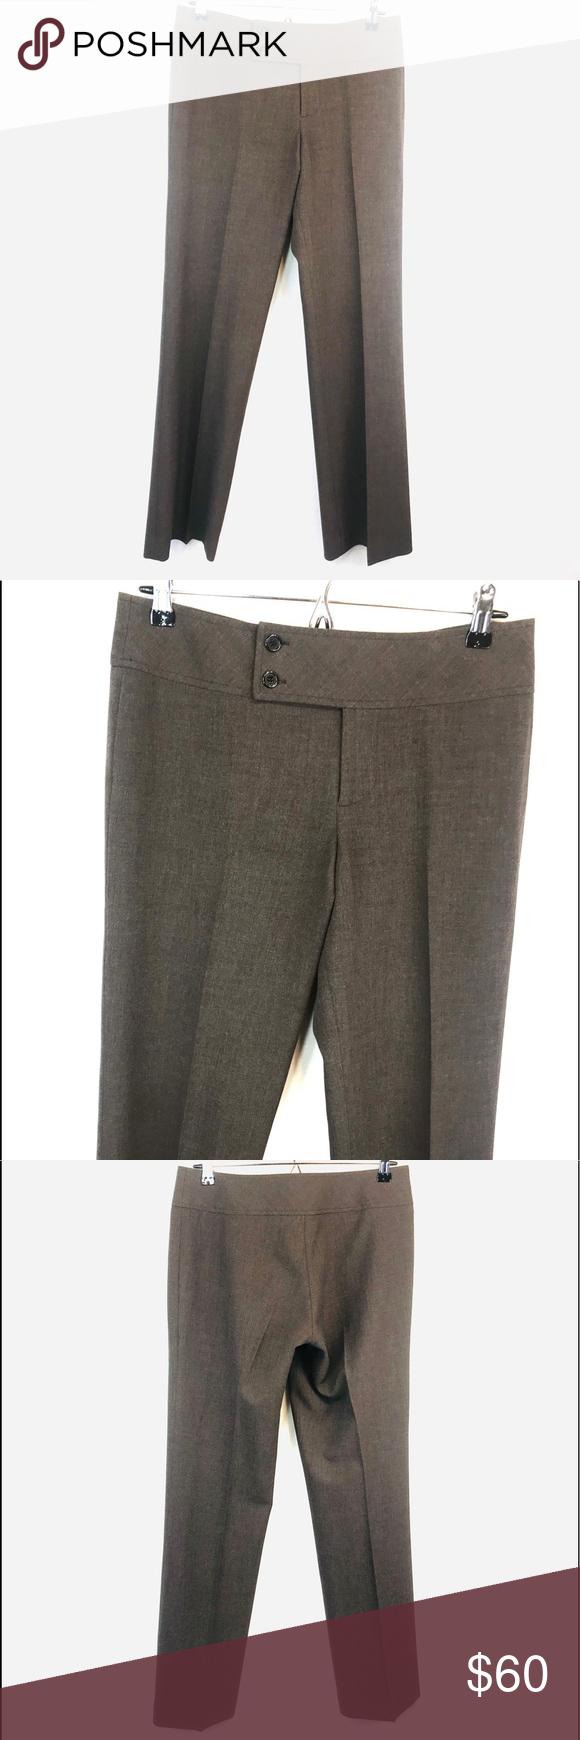 Chaiken Ladies Size 0 Flat Front Wool Dress Pants Light Brown Special Summer Sale Pants